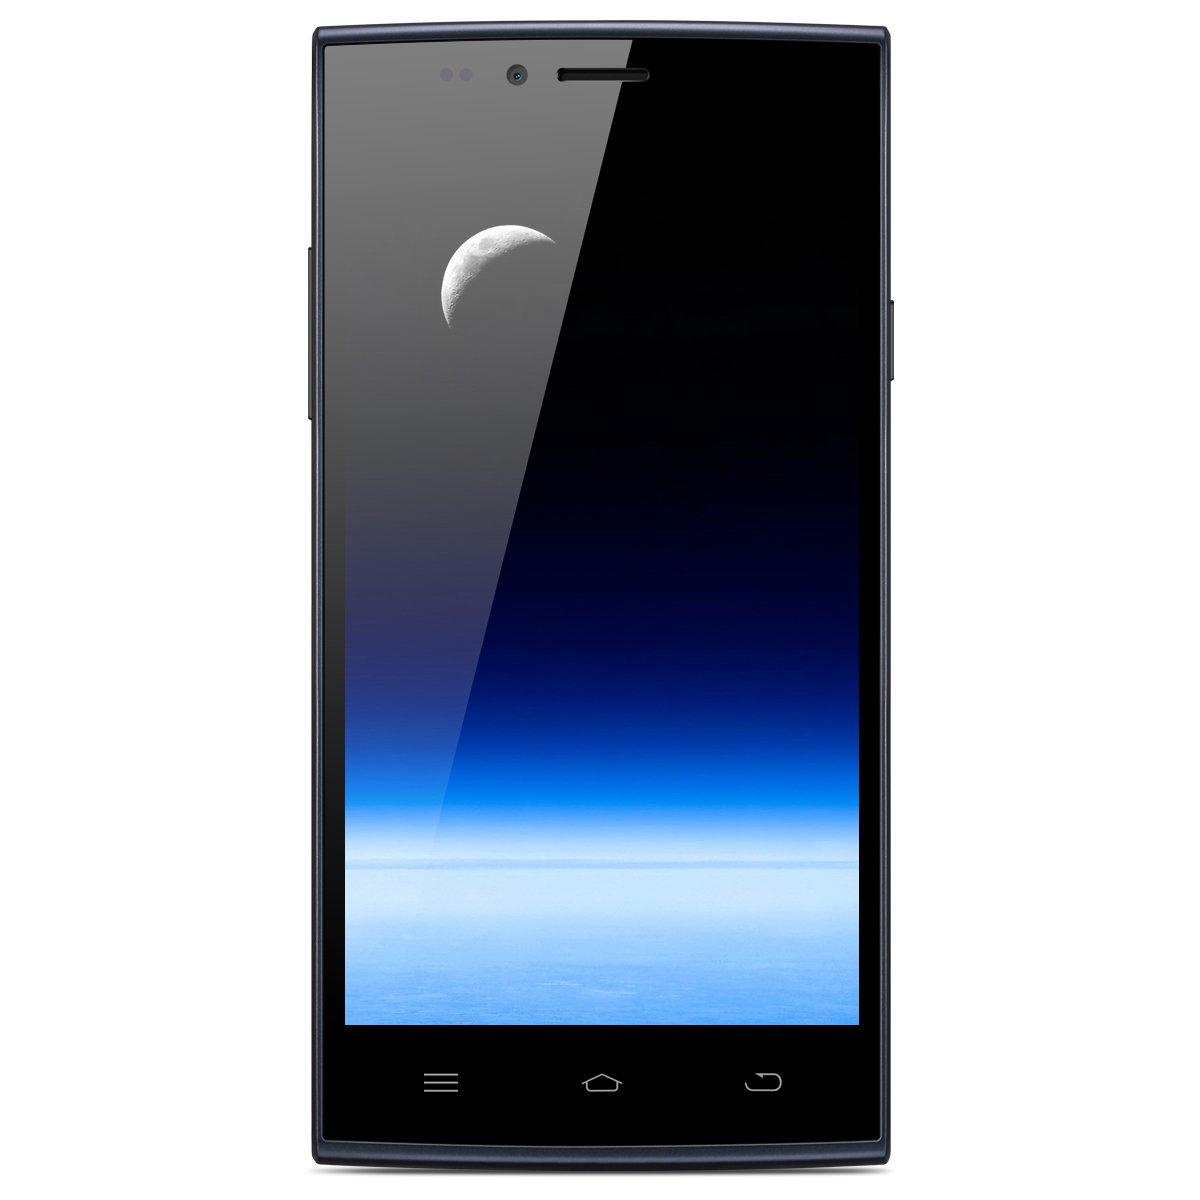 ThL T6C 3G Smartphone MTK6580 Cortex A7 Quad Core 1.3GHz 5.0 ...